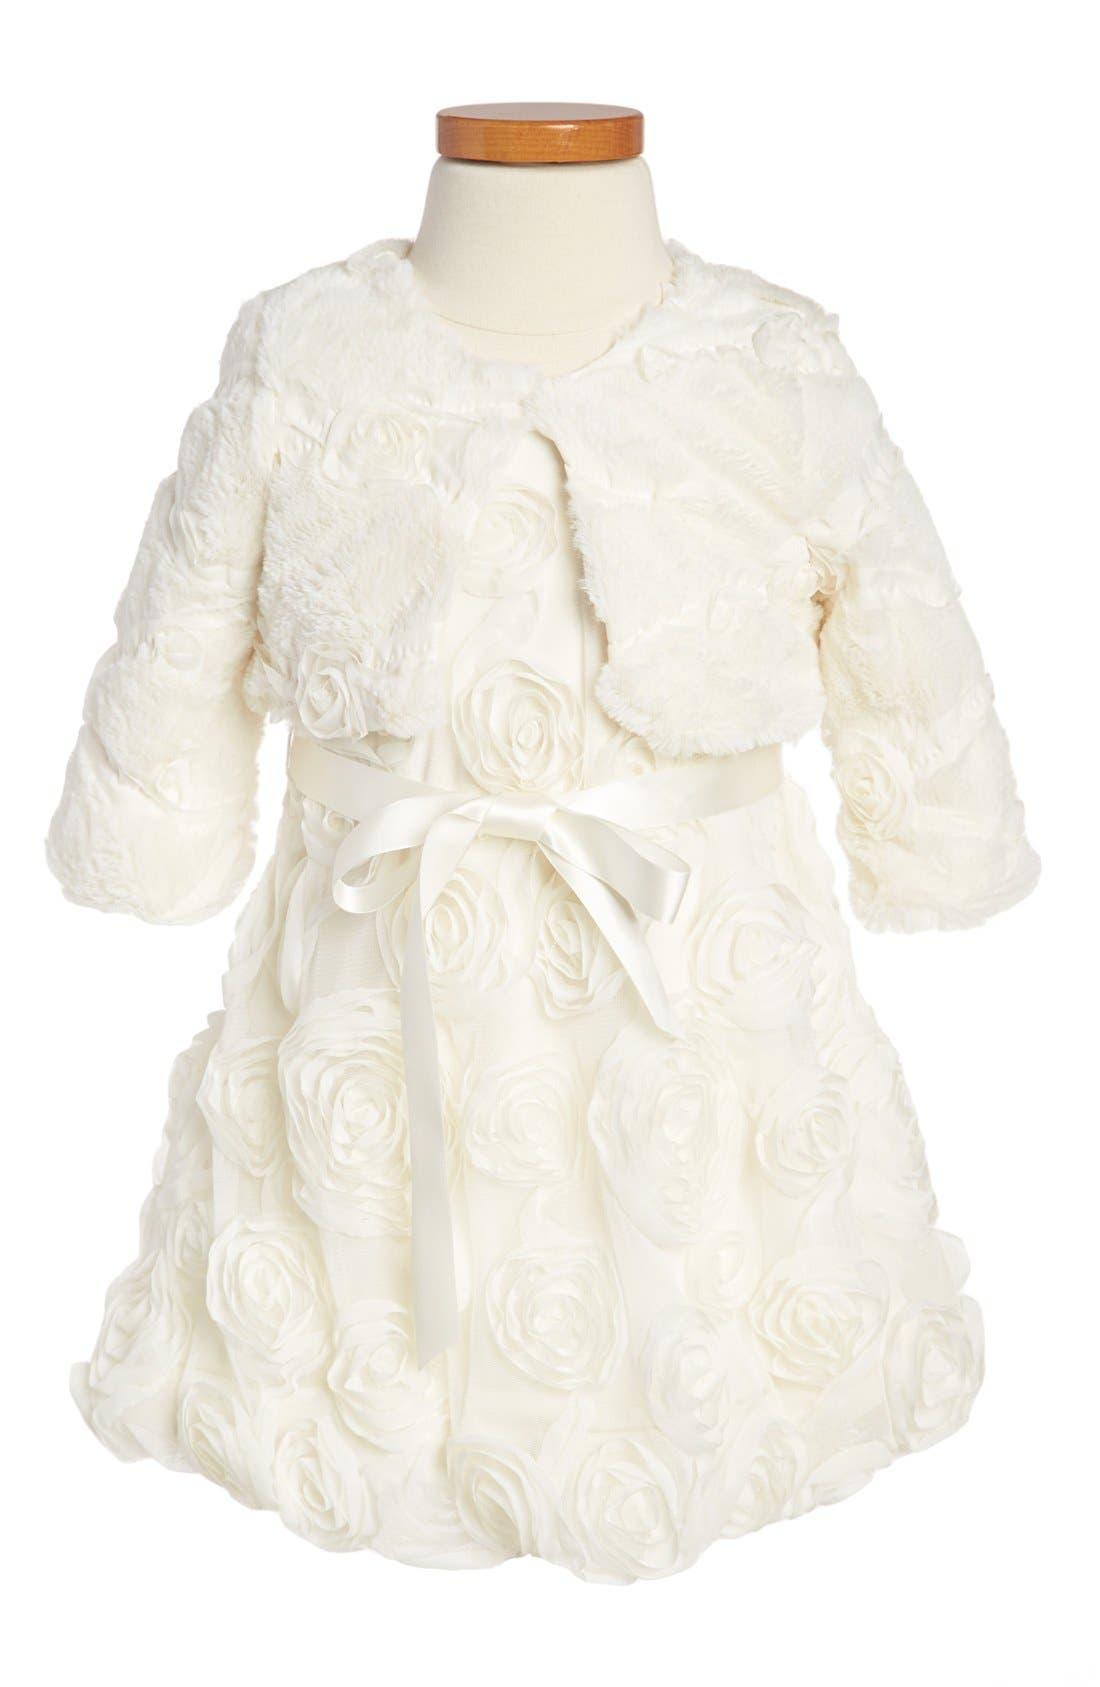 Main Image - Iris & Ivy Rosette Dress & Faux Fur Bolero (Toddler Girls)